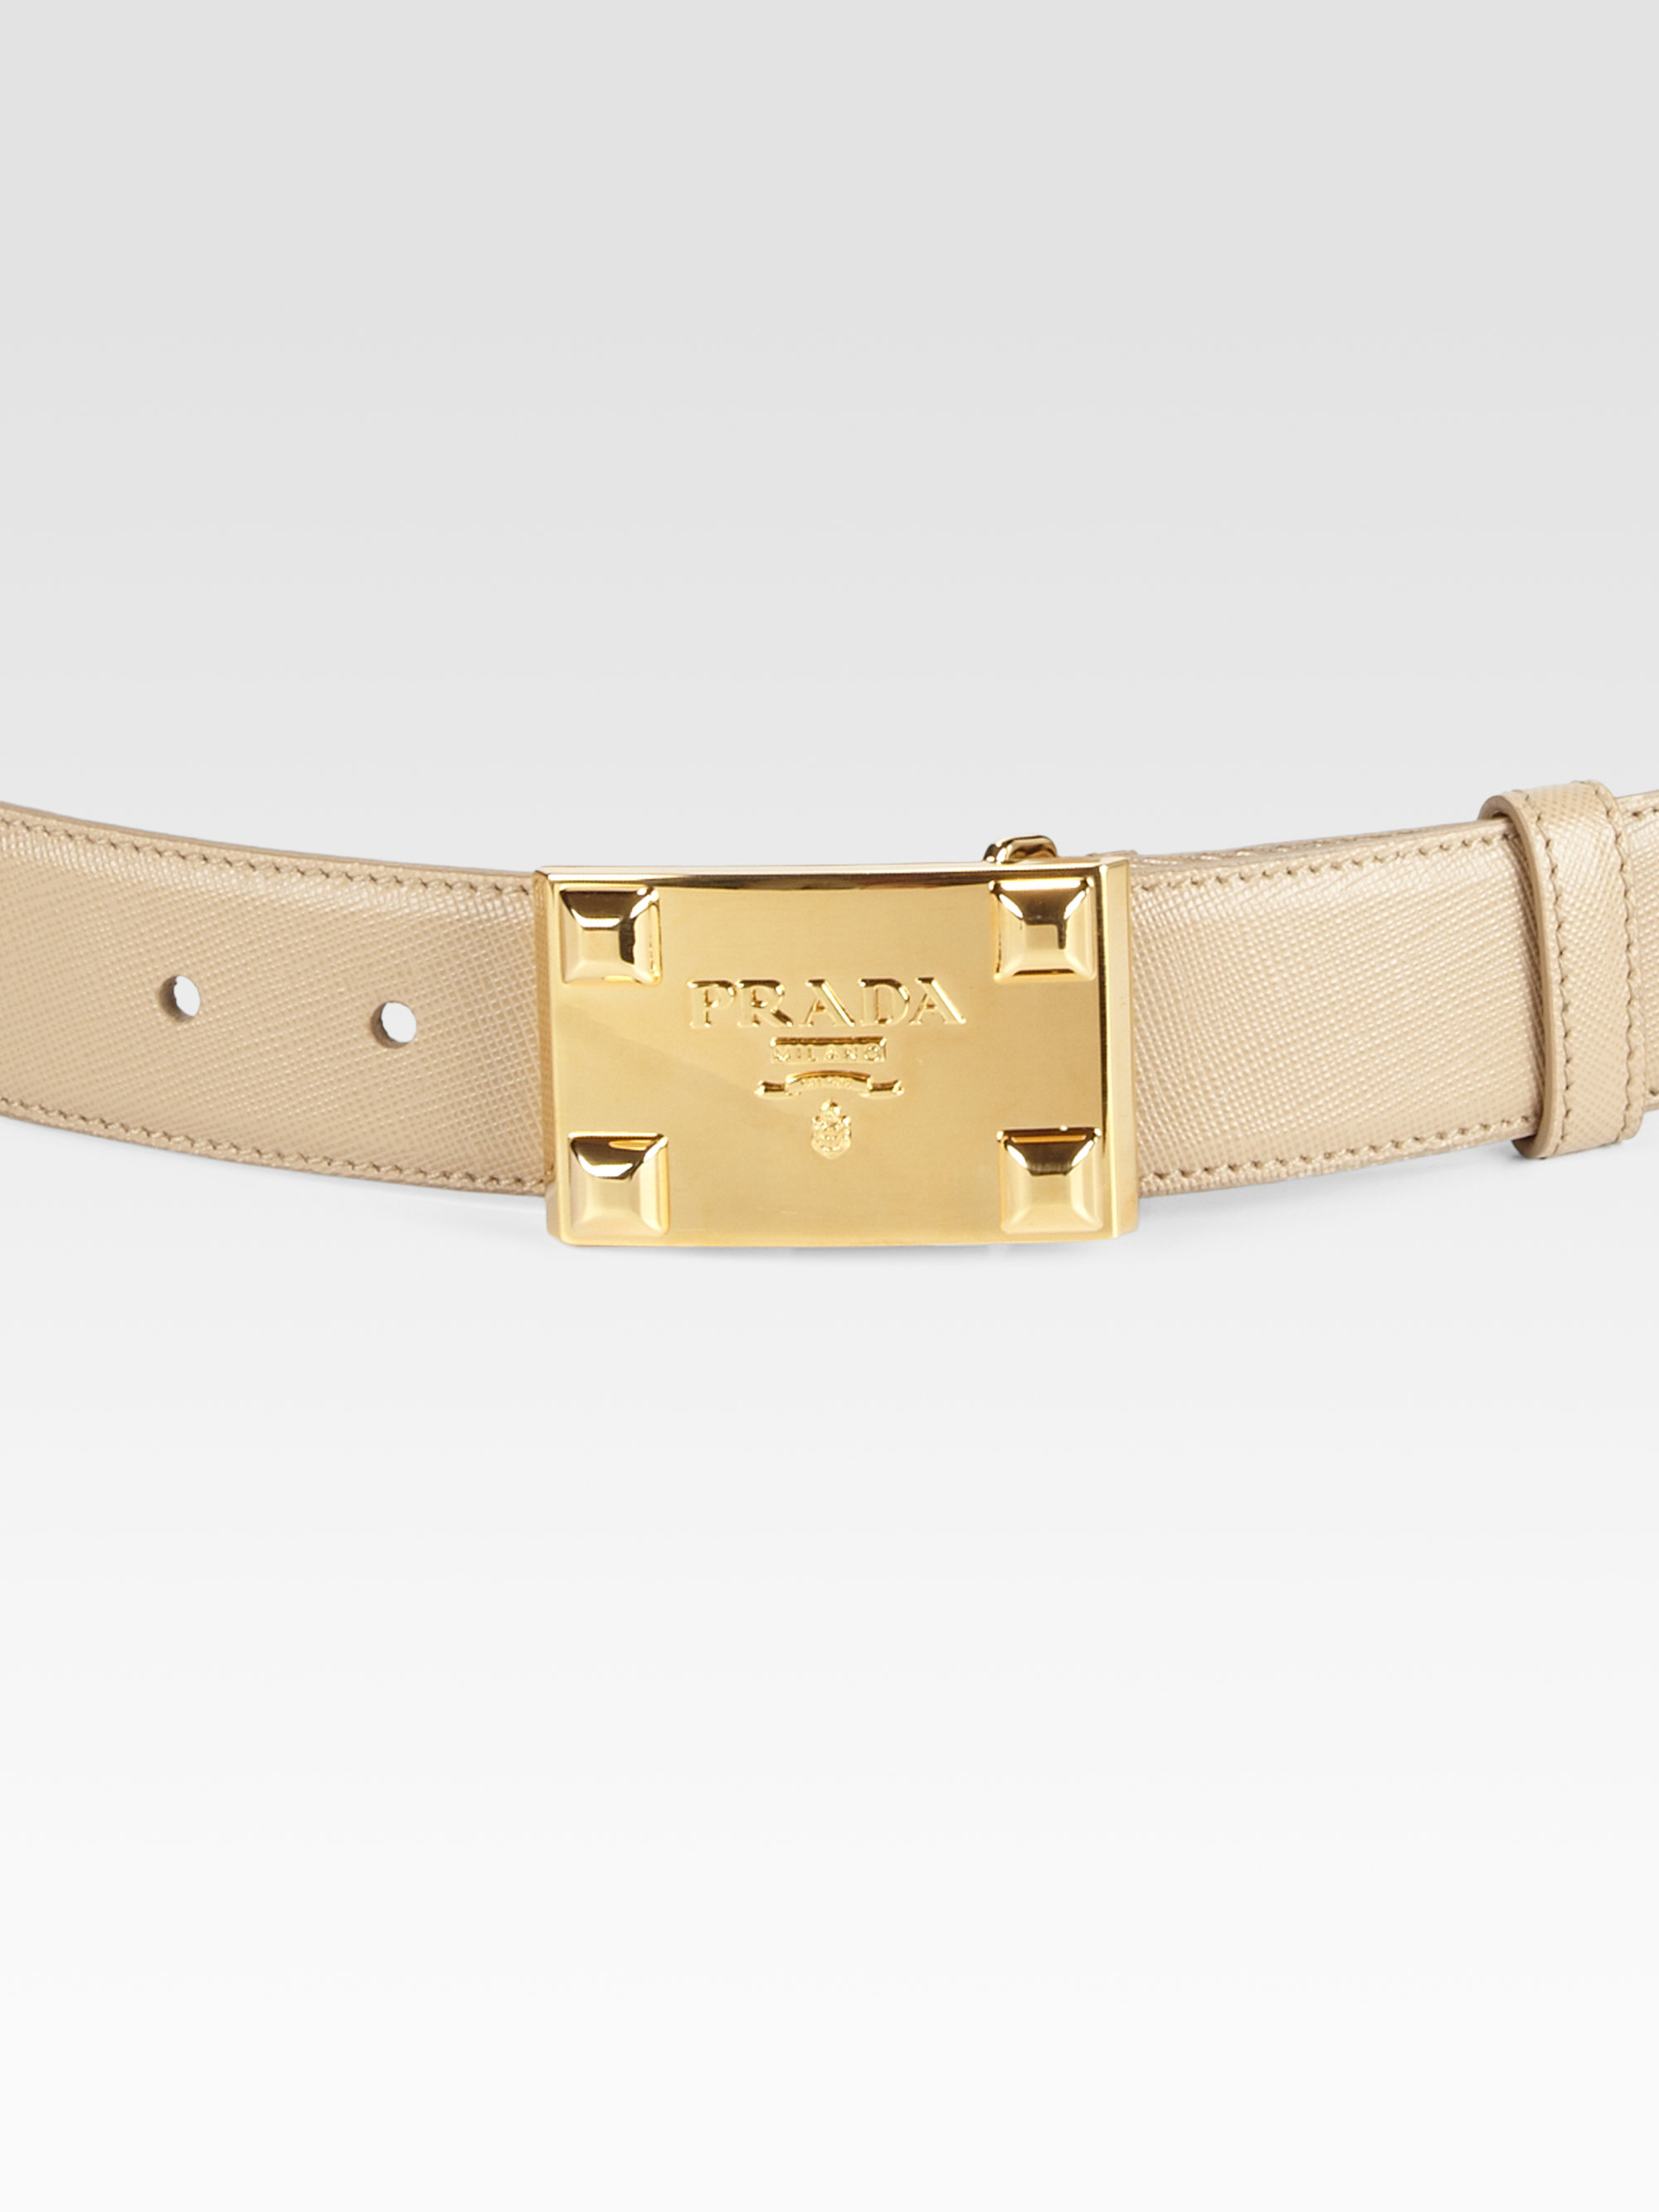 Prada Leather Logo Belt in Beige | Lyst